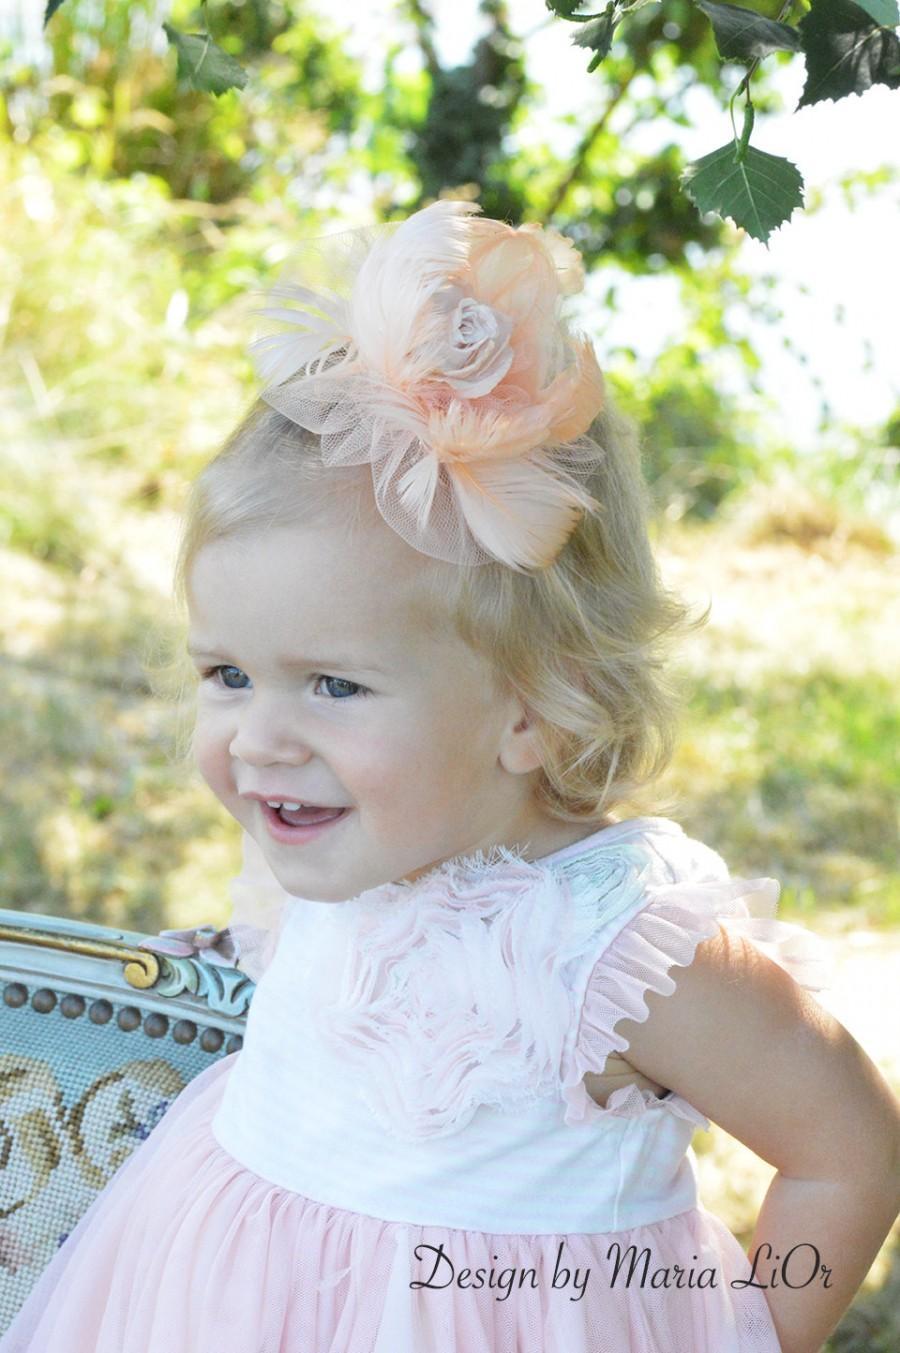 زفاف - Wedding Princess hair accessory. Handmade flower girl hair piece.  Flower girls head accessory. Flower girls gift. Flower gils headband.